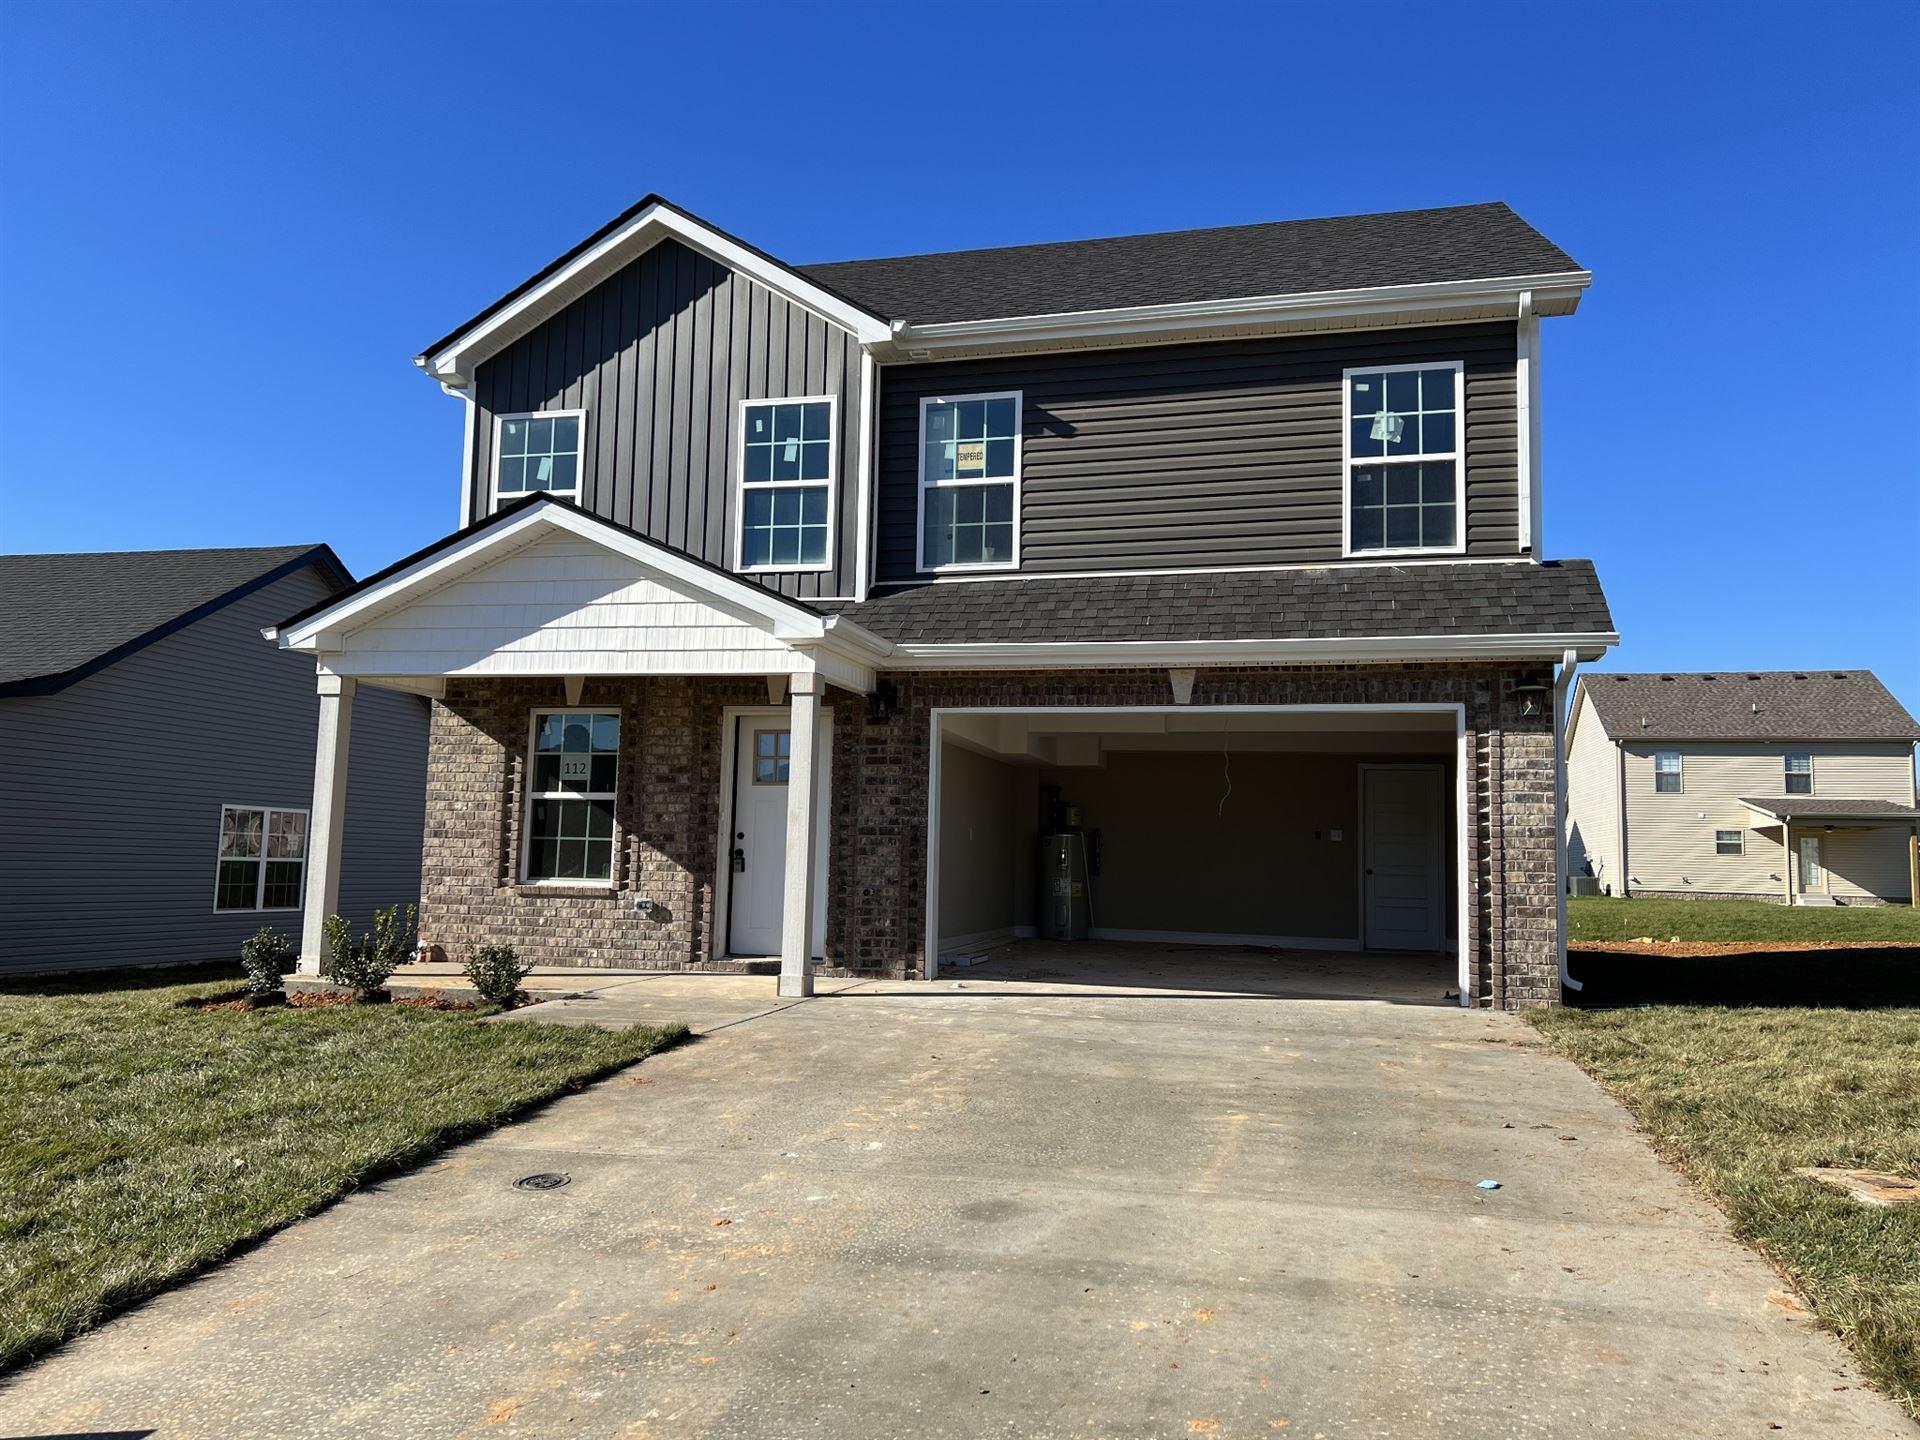 112 Irish Hills, Clarksville, TN 37042 - MLS#: 2291736